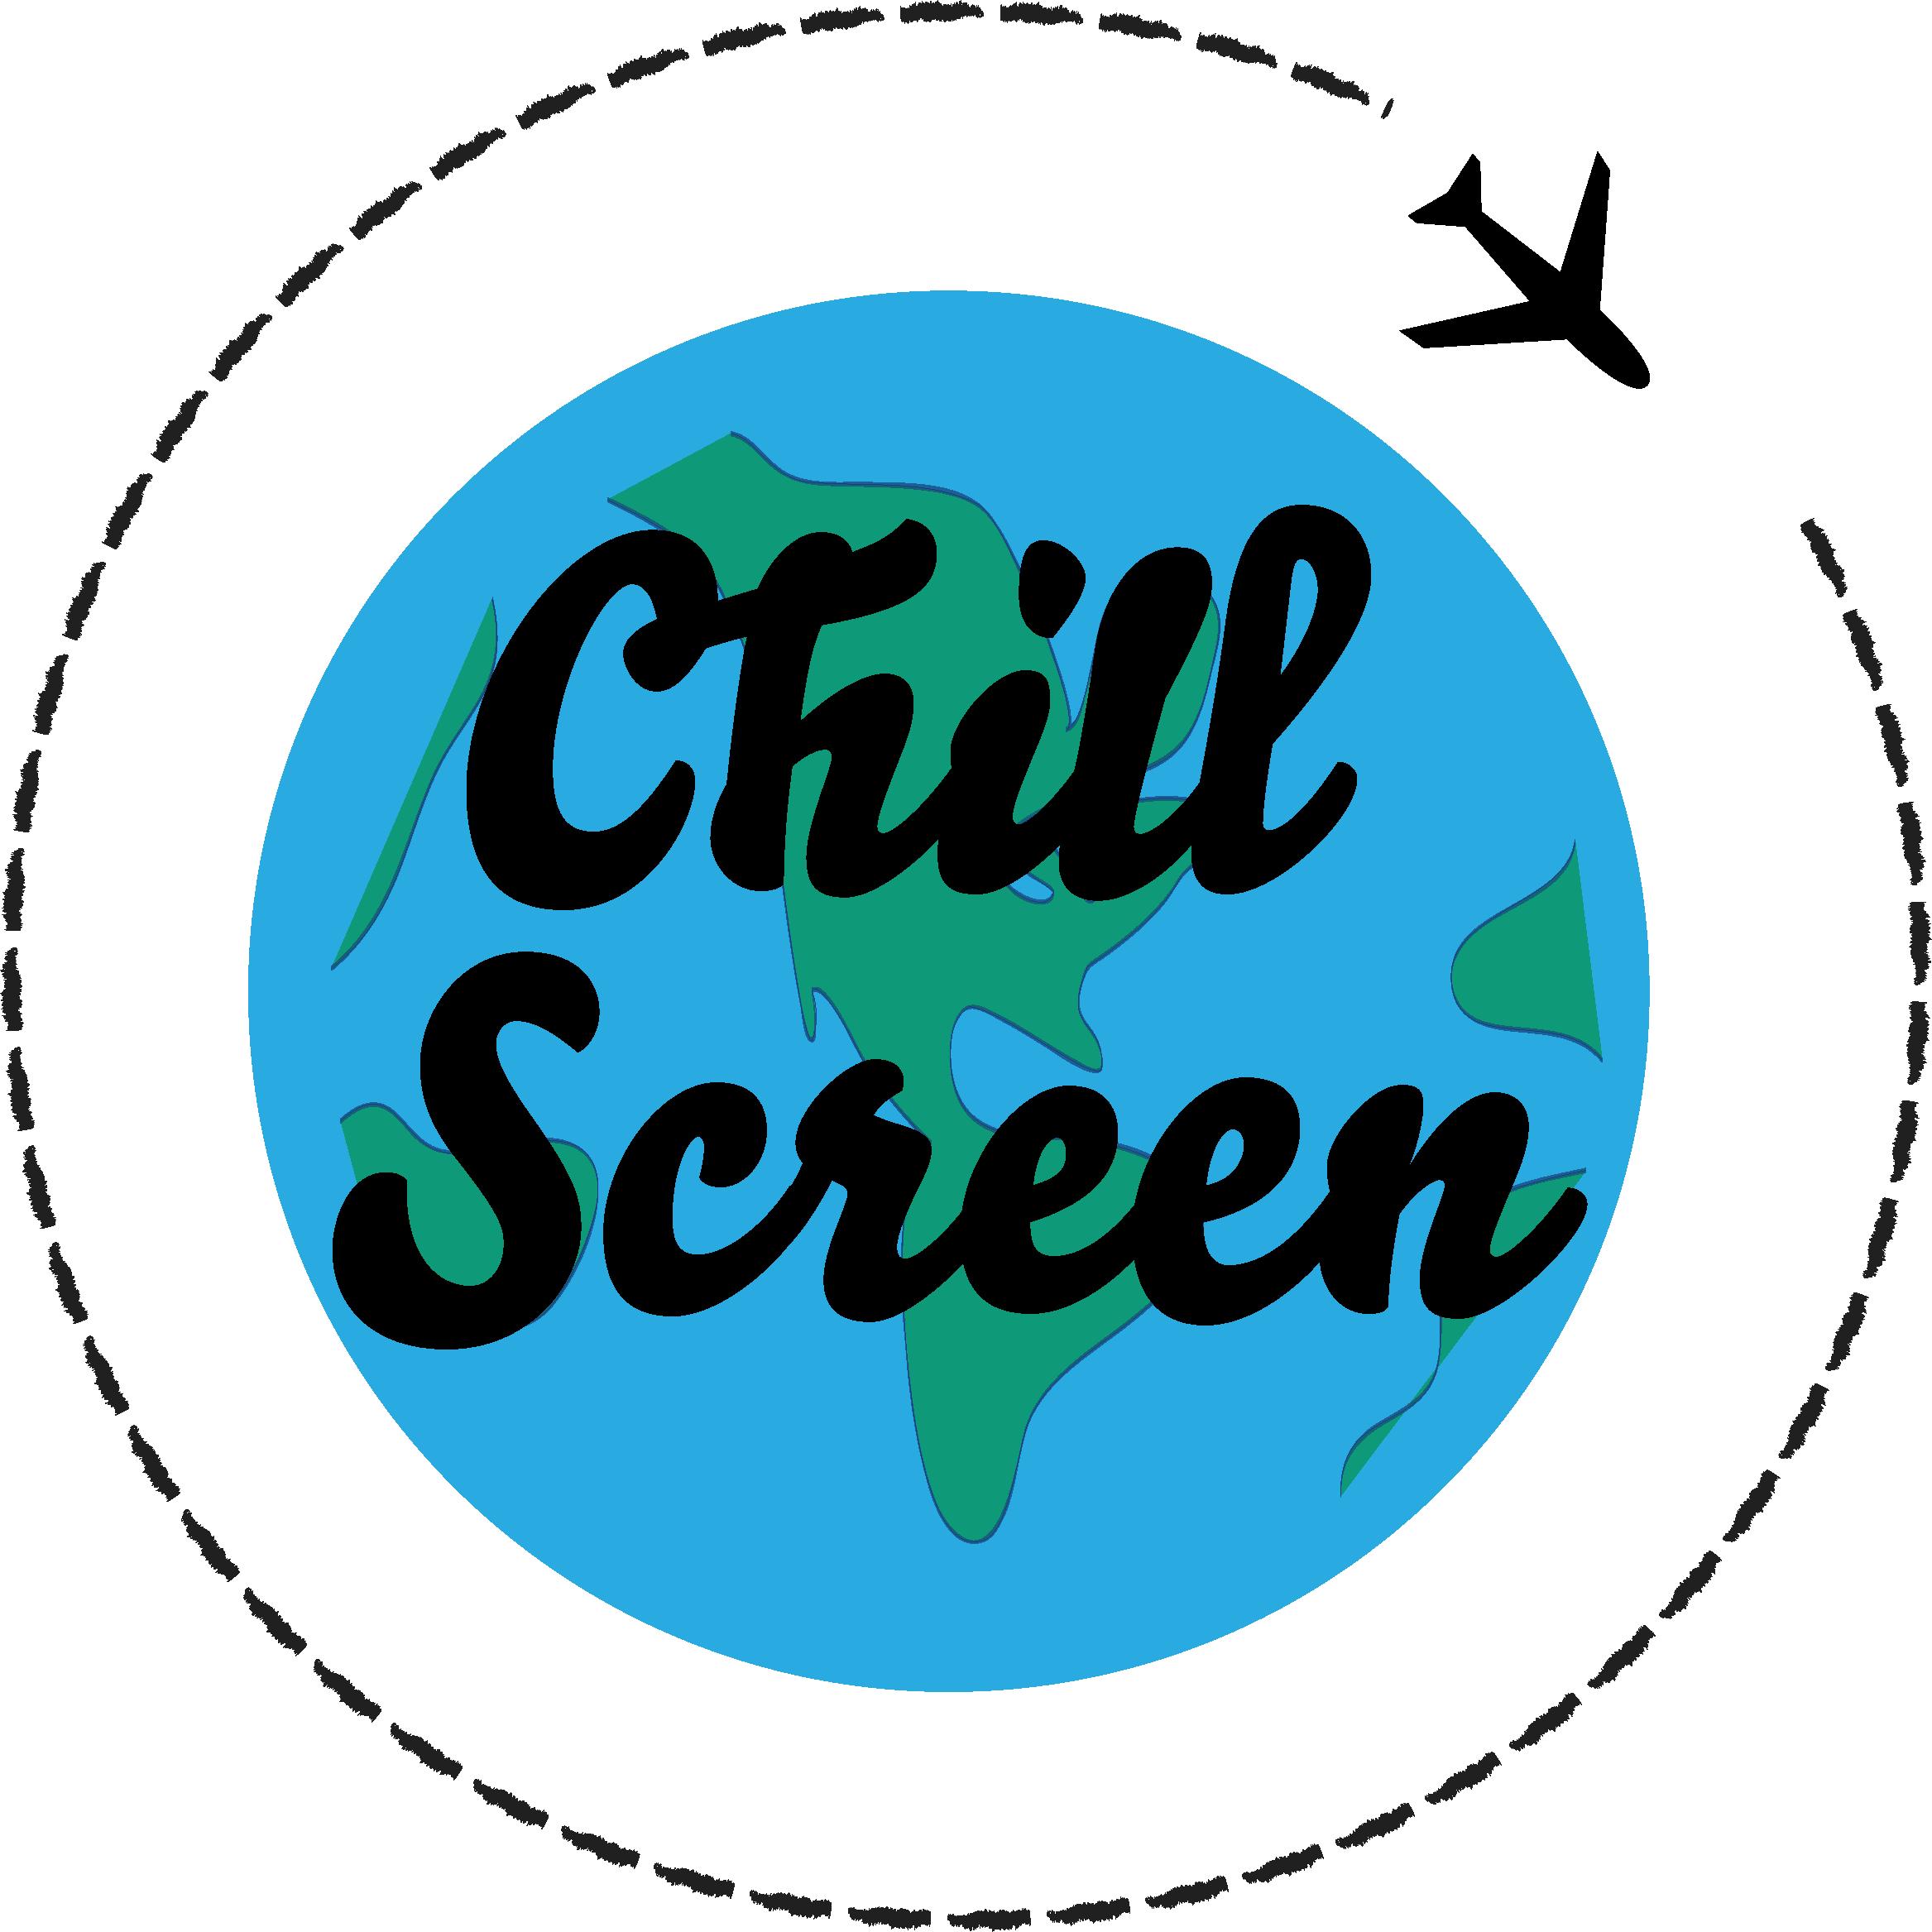 Chillscreen